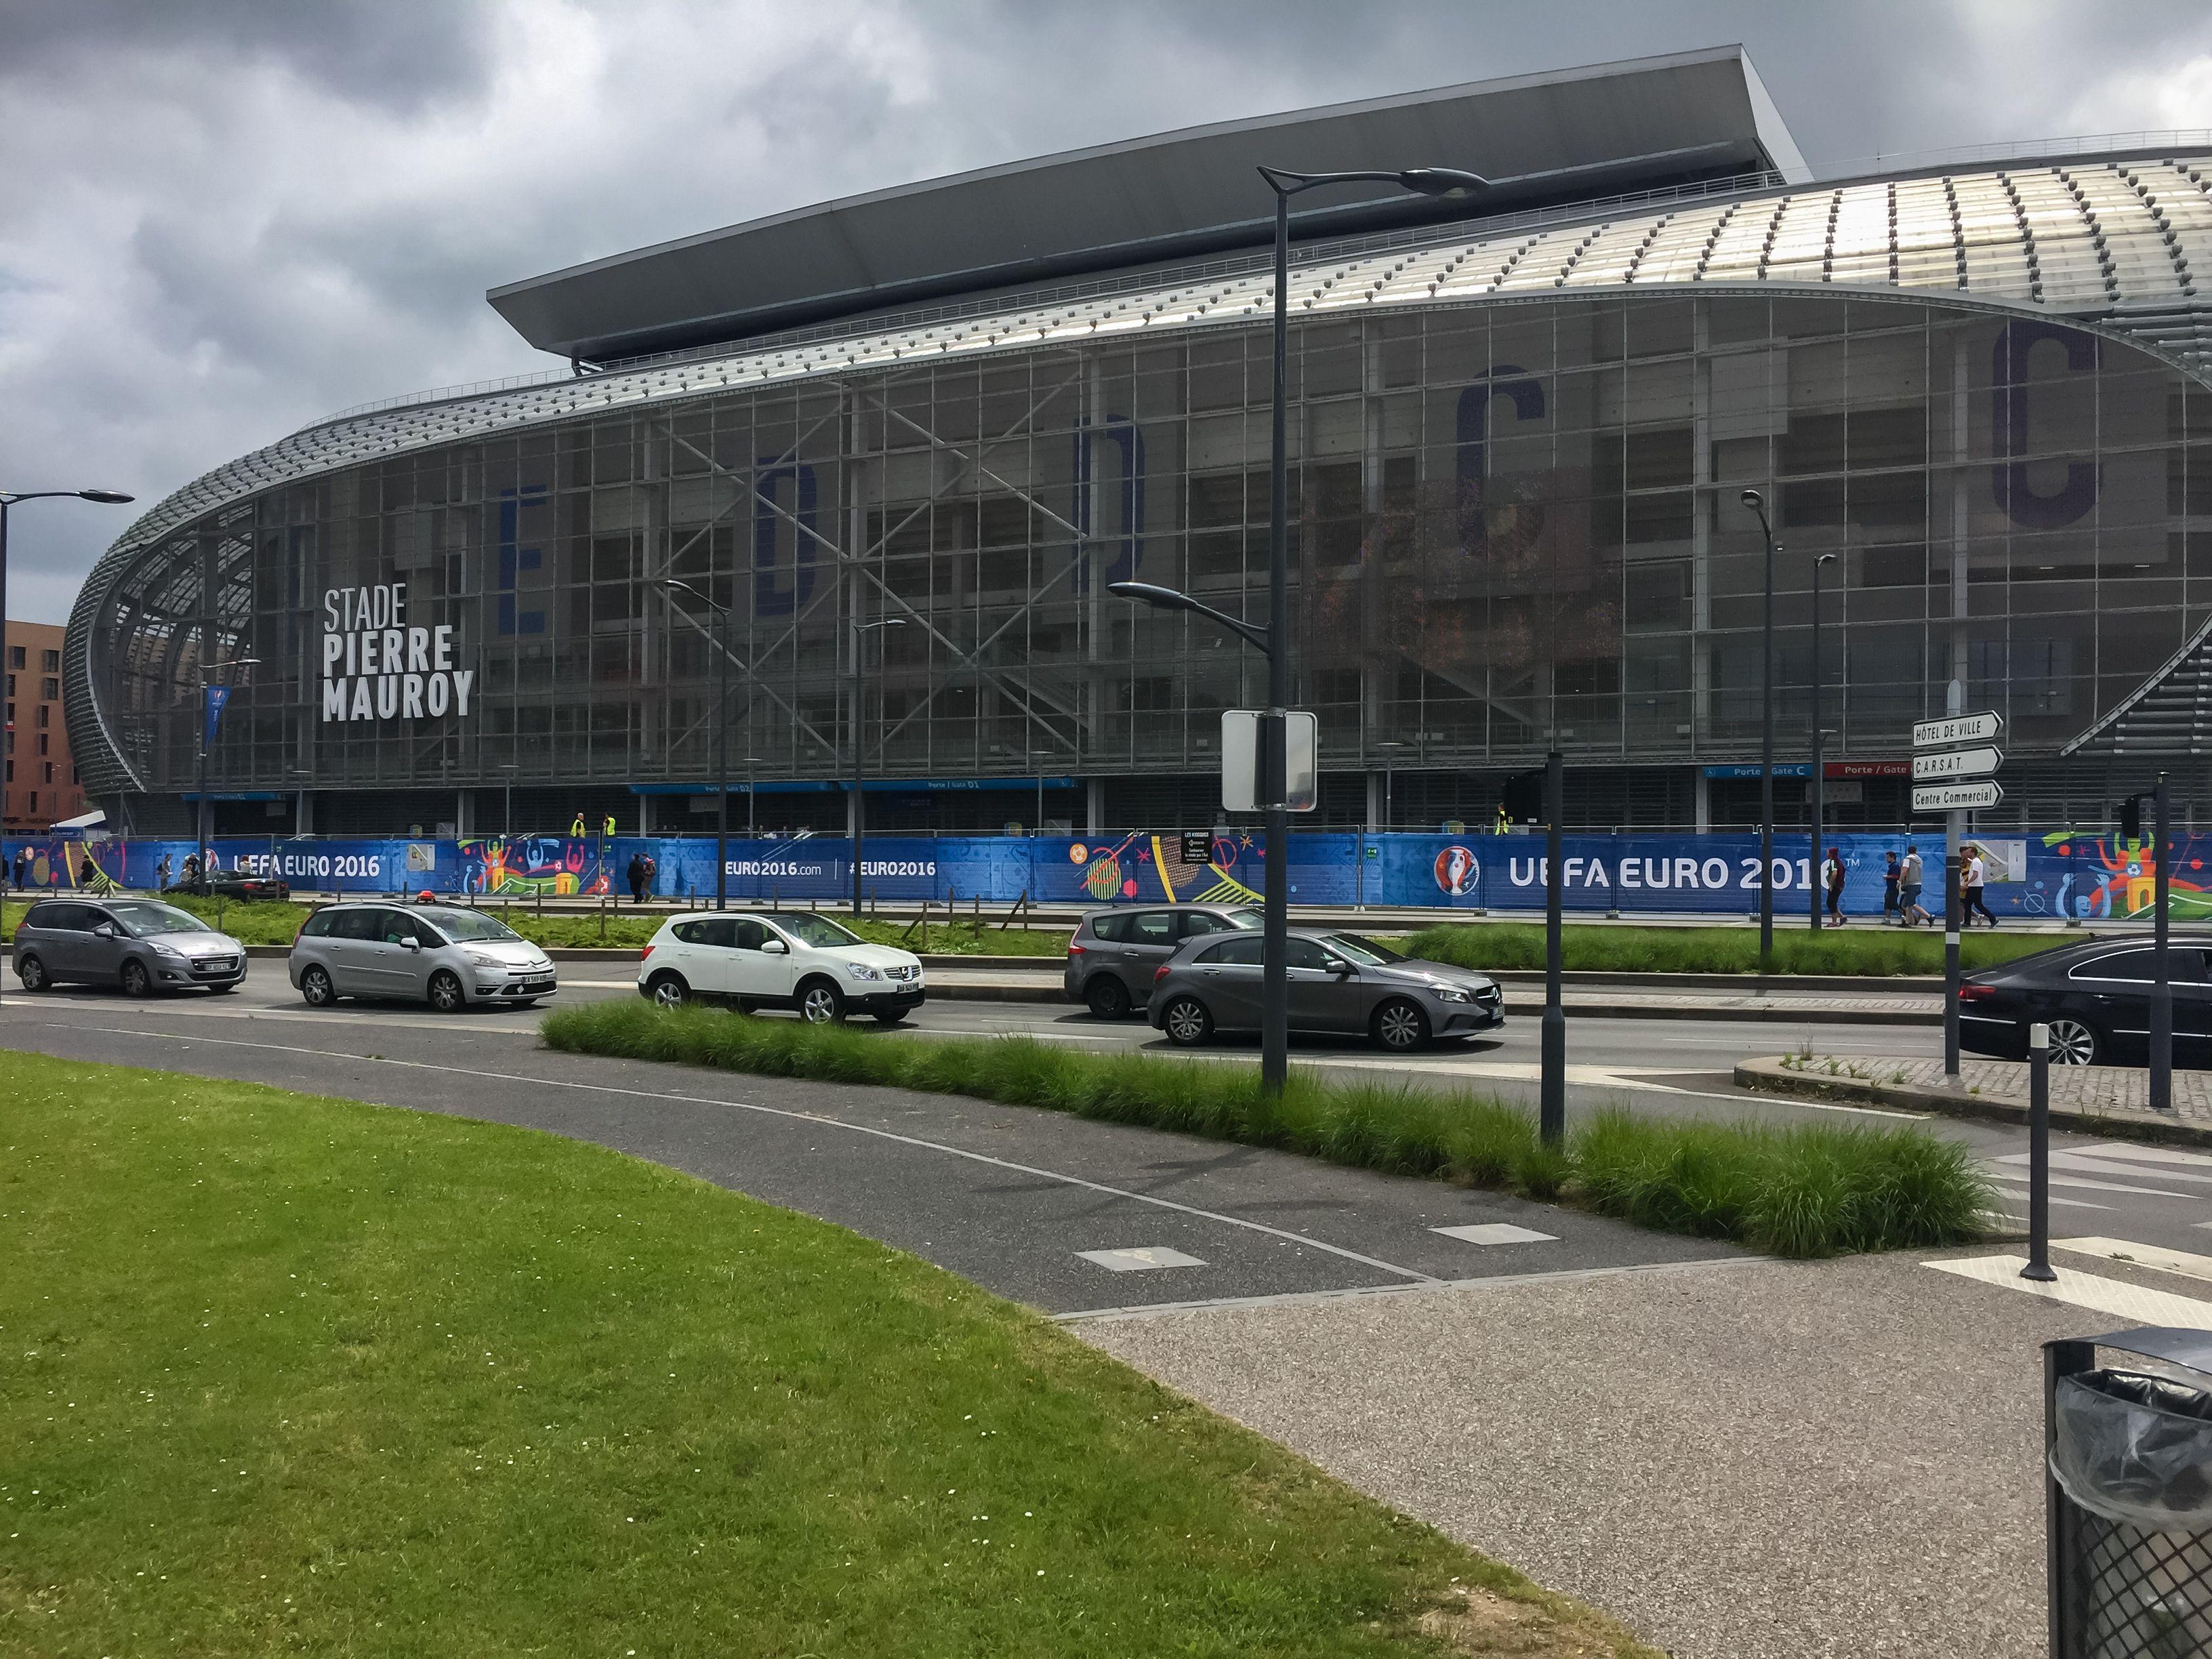 Lille Stadion Pierre Mauroy